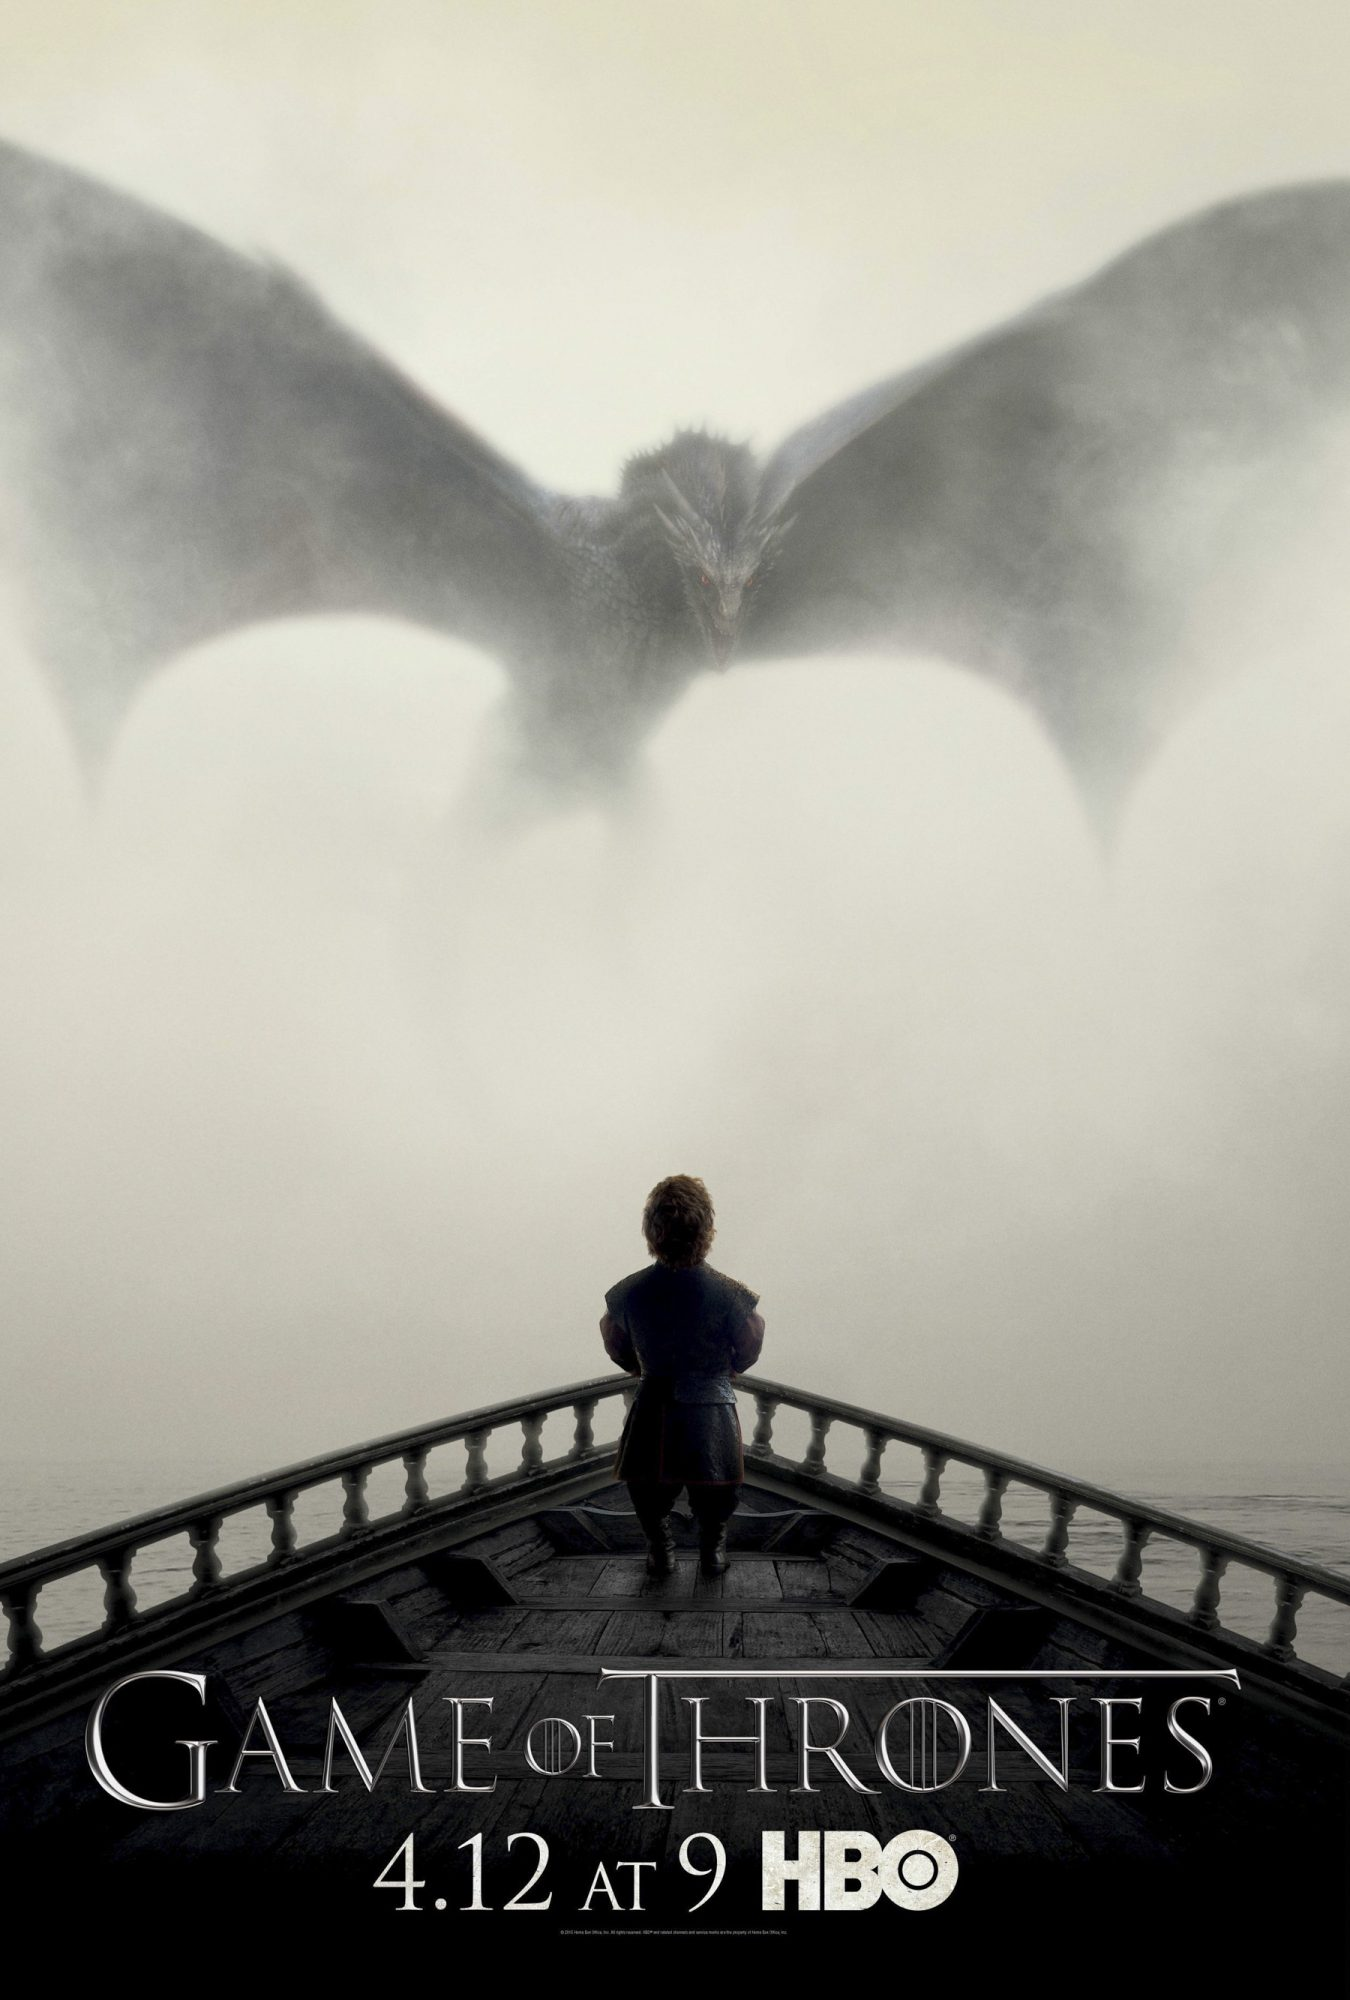 Game of Thrones poster/key artSeason 5CR: HBO